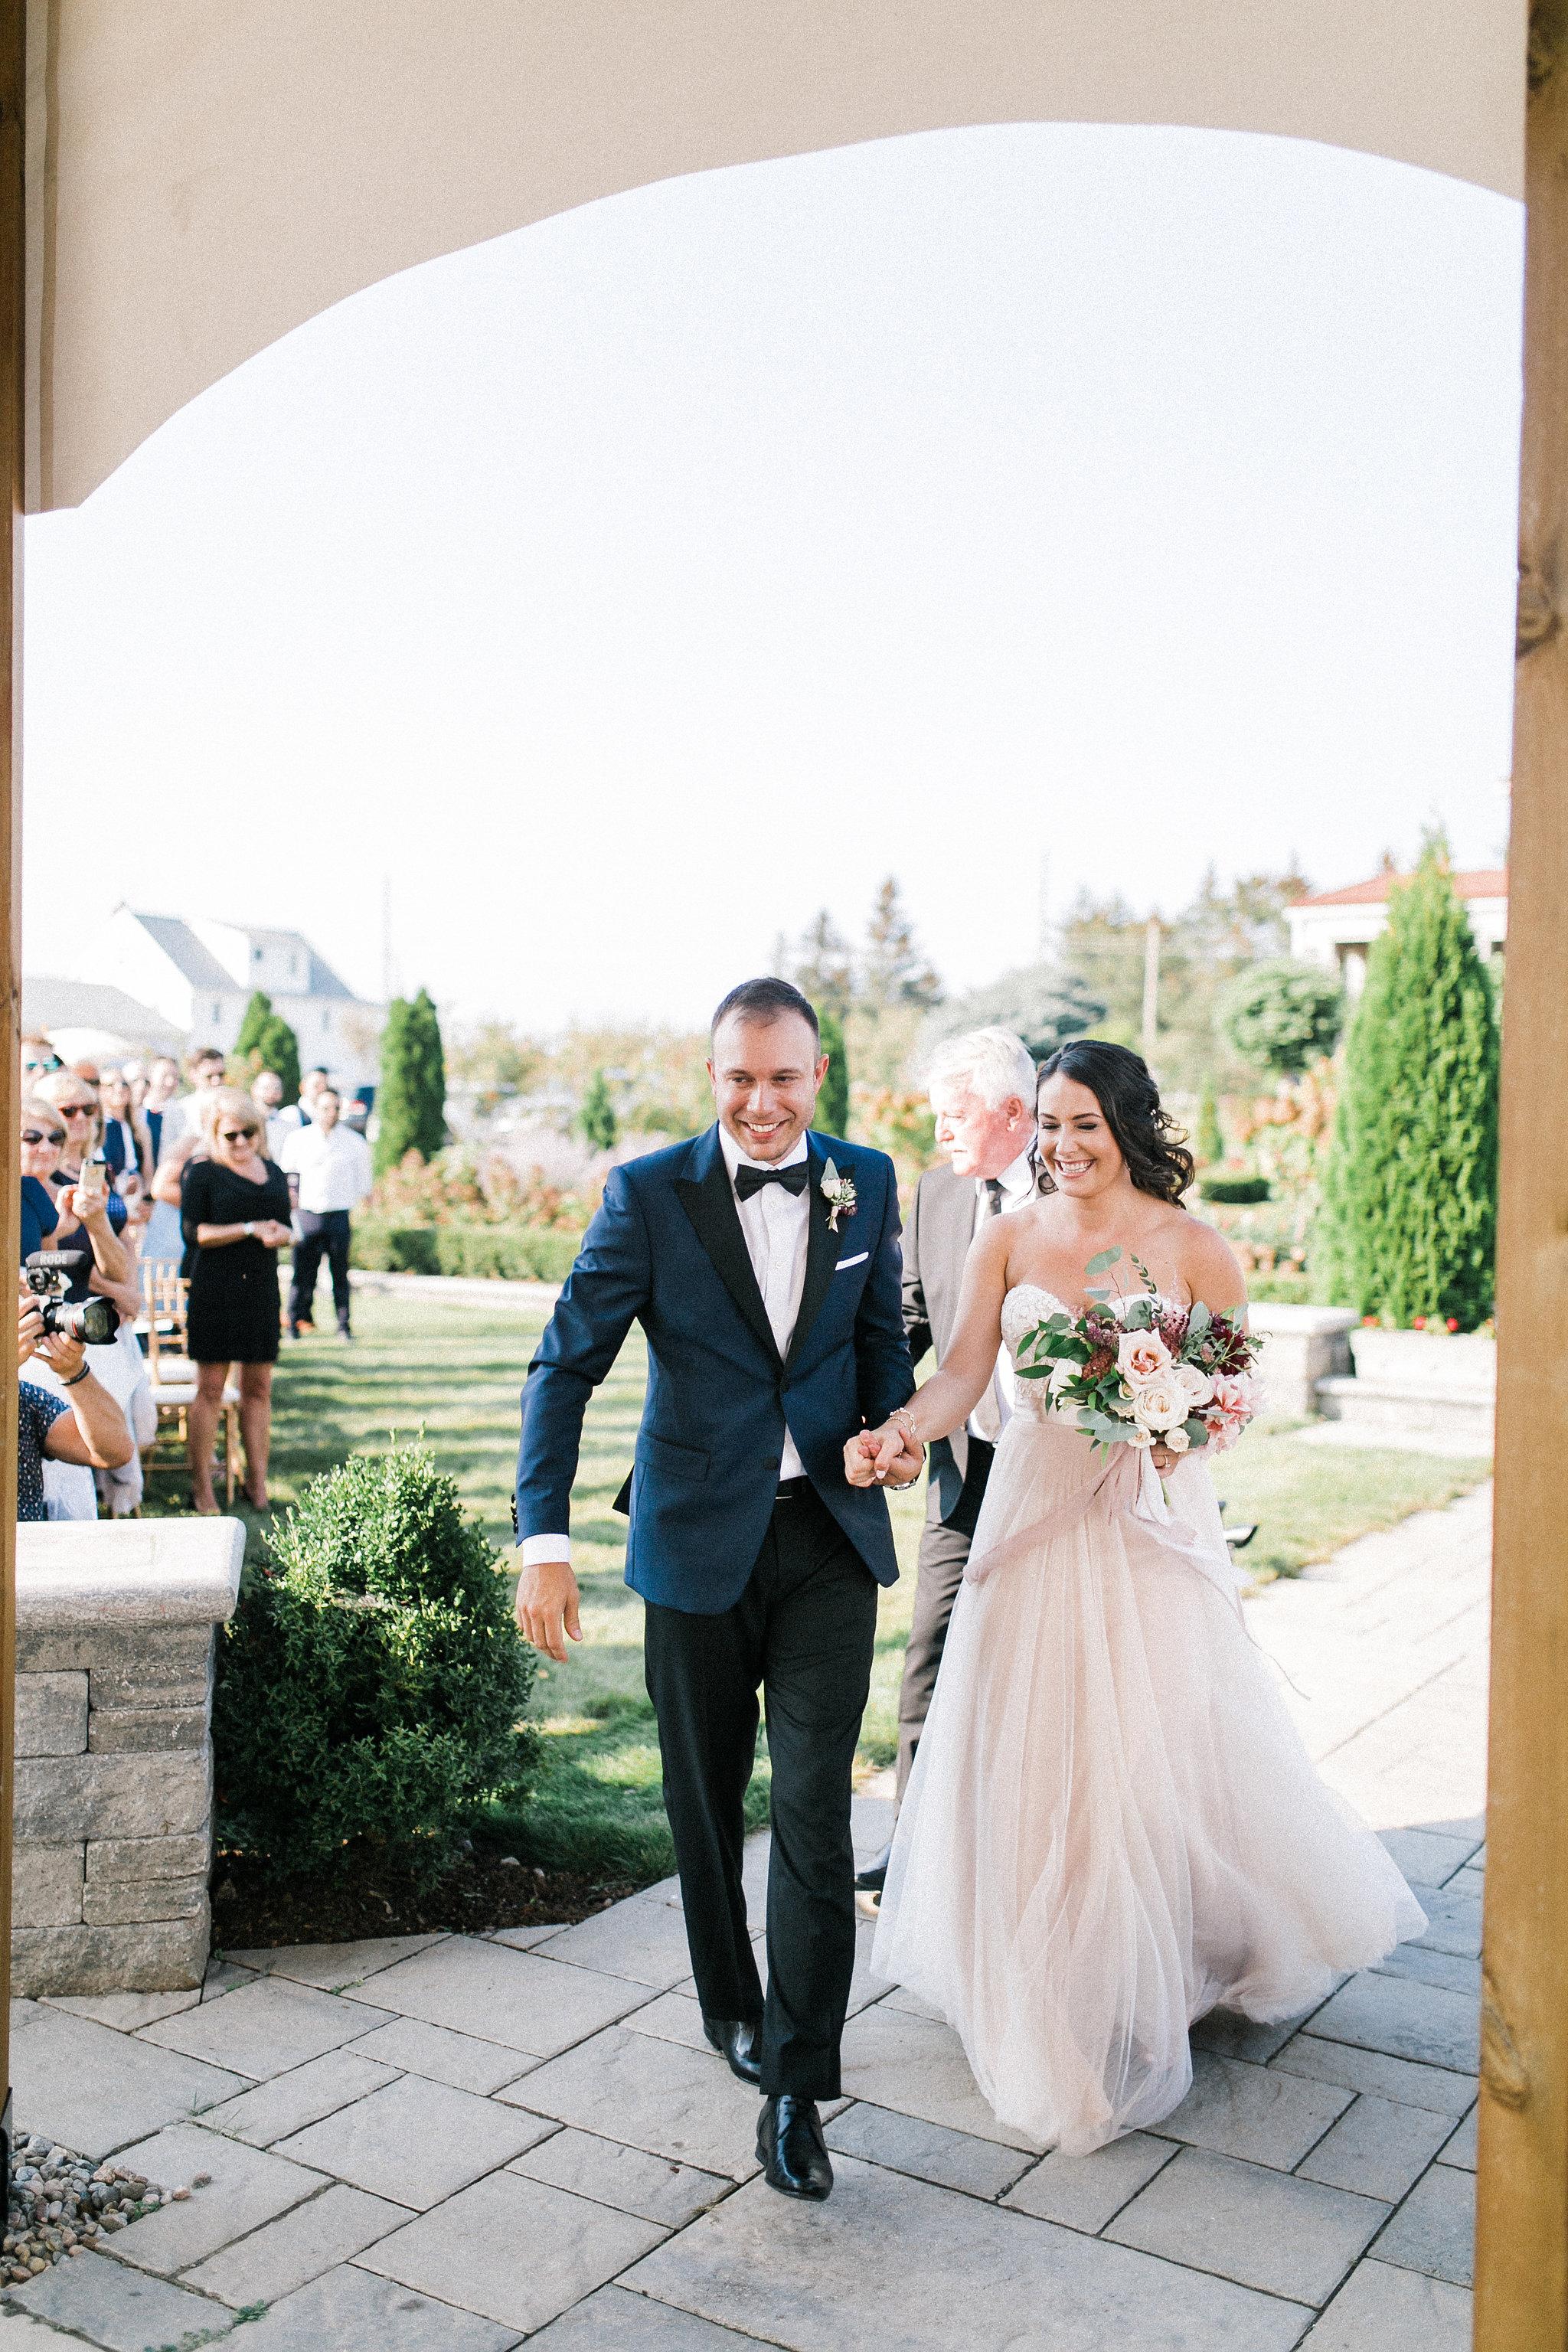 ksp_Ashleigh&Cameron_married-496.jpg